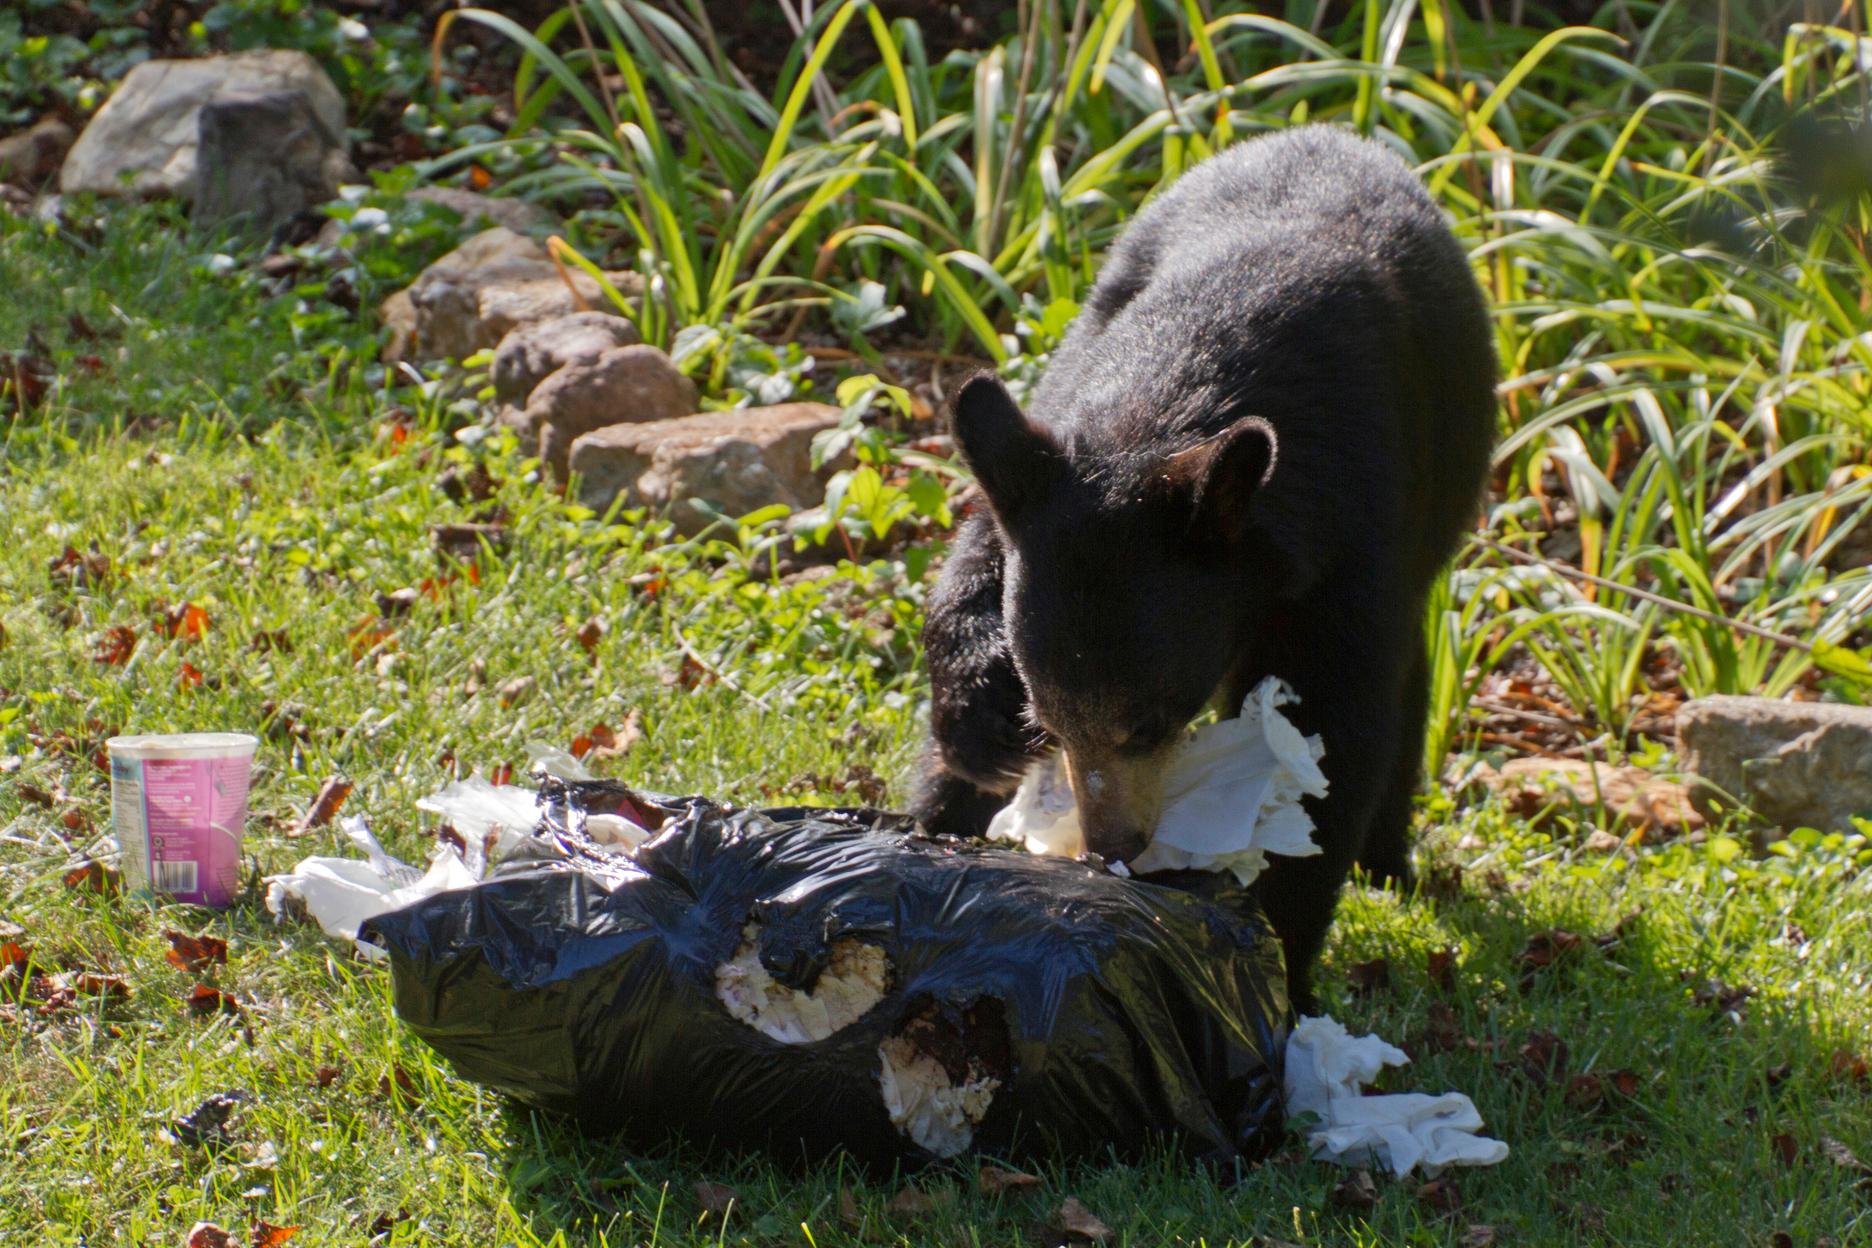 American Black Bear cub eating through a garbage bag